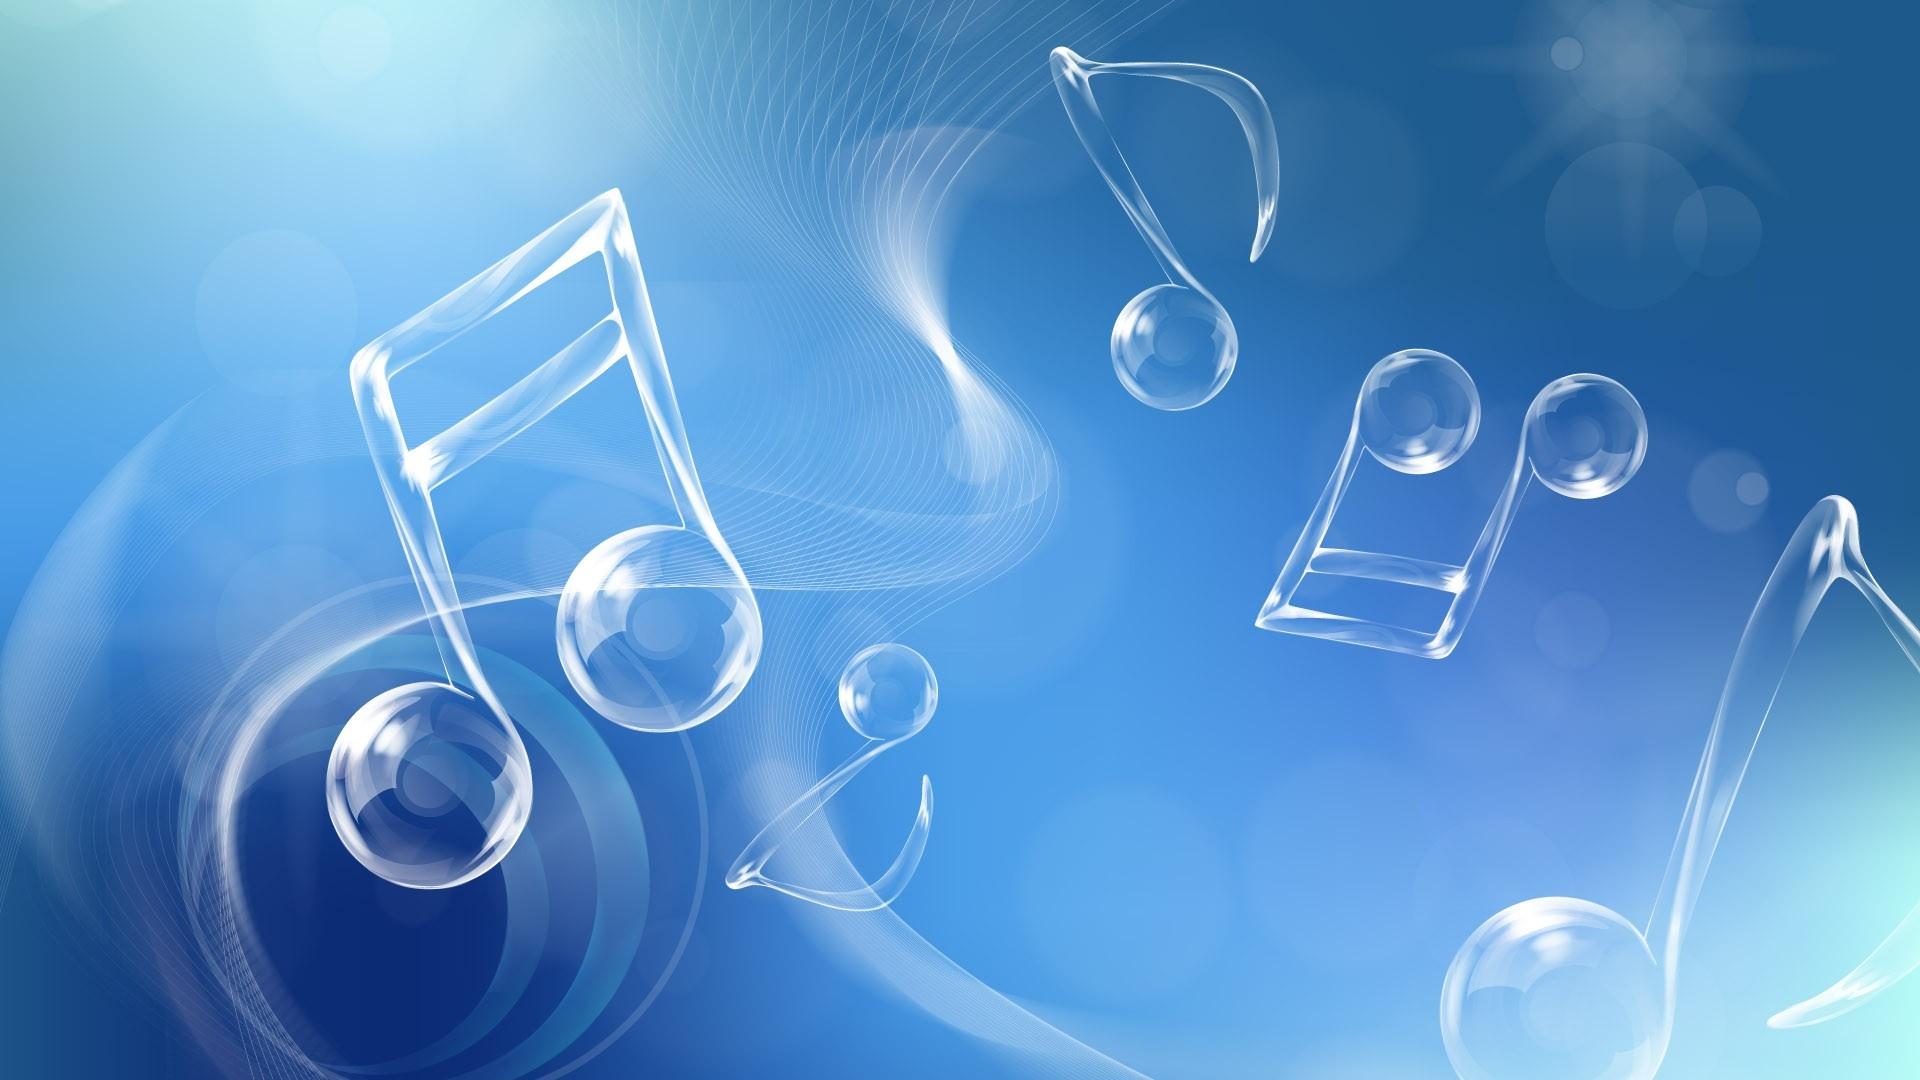 Most Inspiring Wallpaper Blue Music - blue_white_music_shapes_282_1920x1080  Gallery_597049.jpg